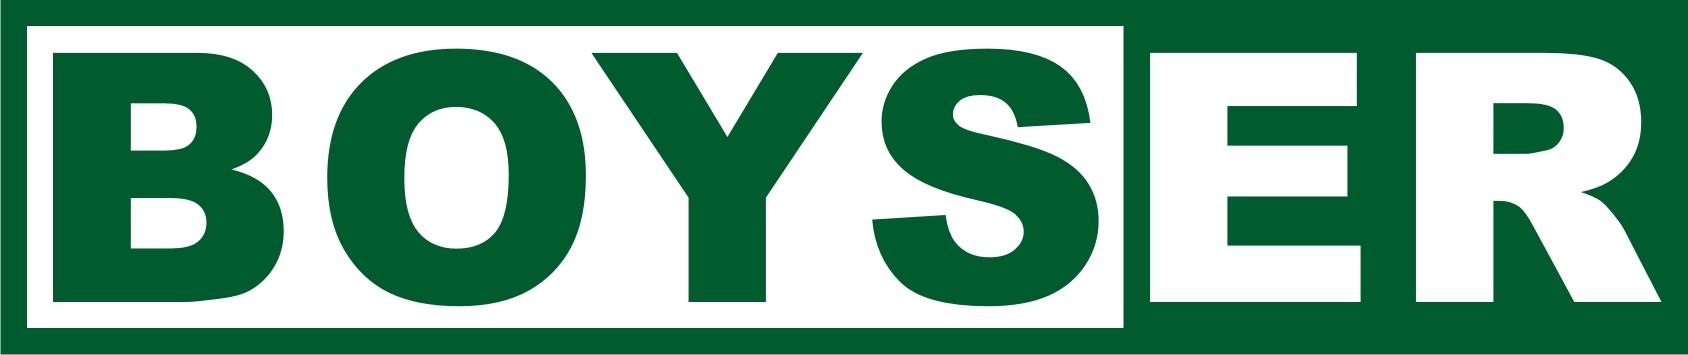 Boyser.eu - Online obchod